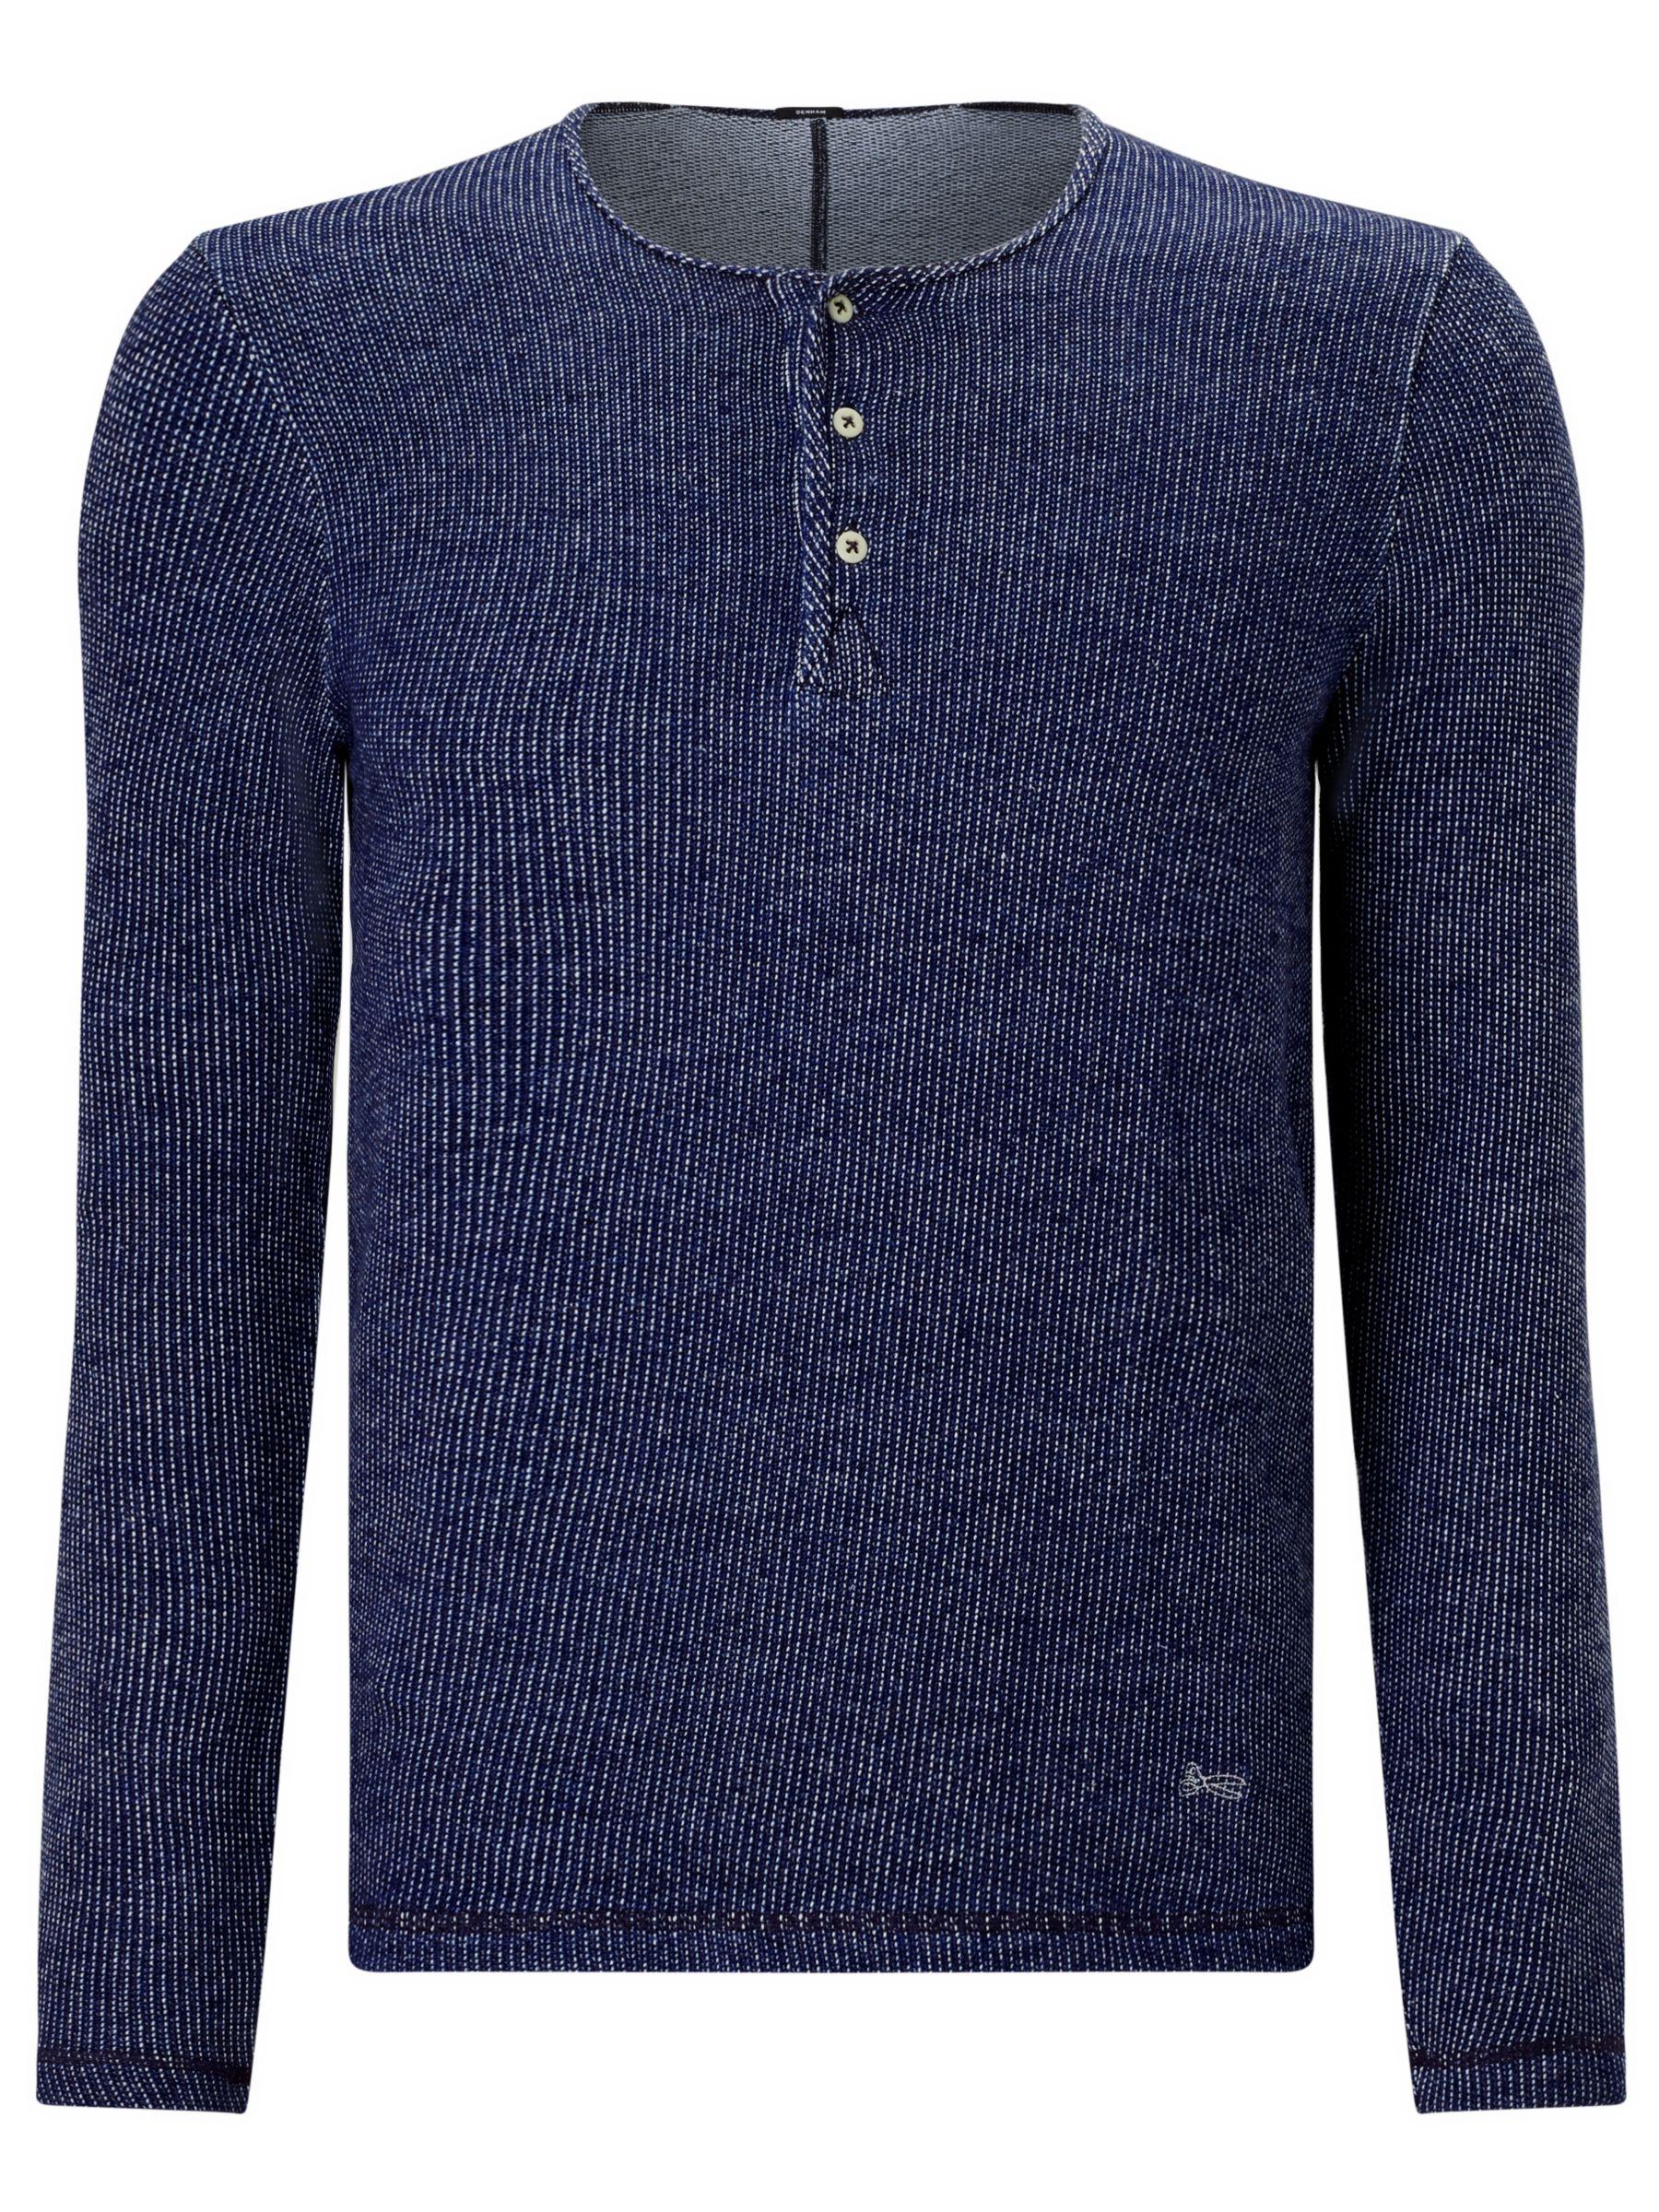 Denham Denham Irvin Henley Long Sleeve Shirt, Indigo